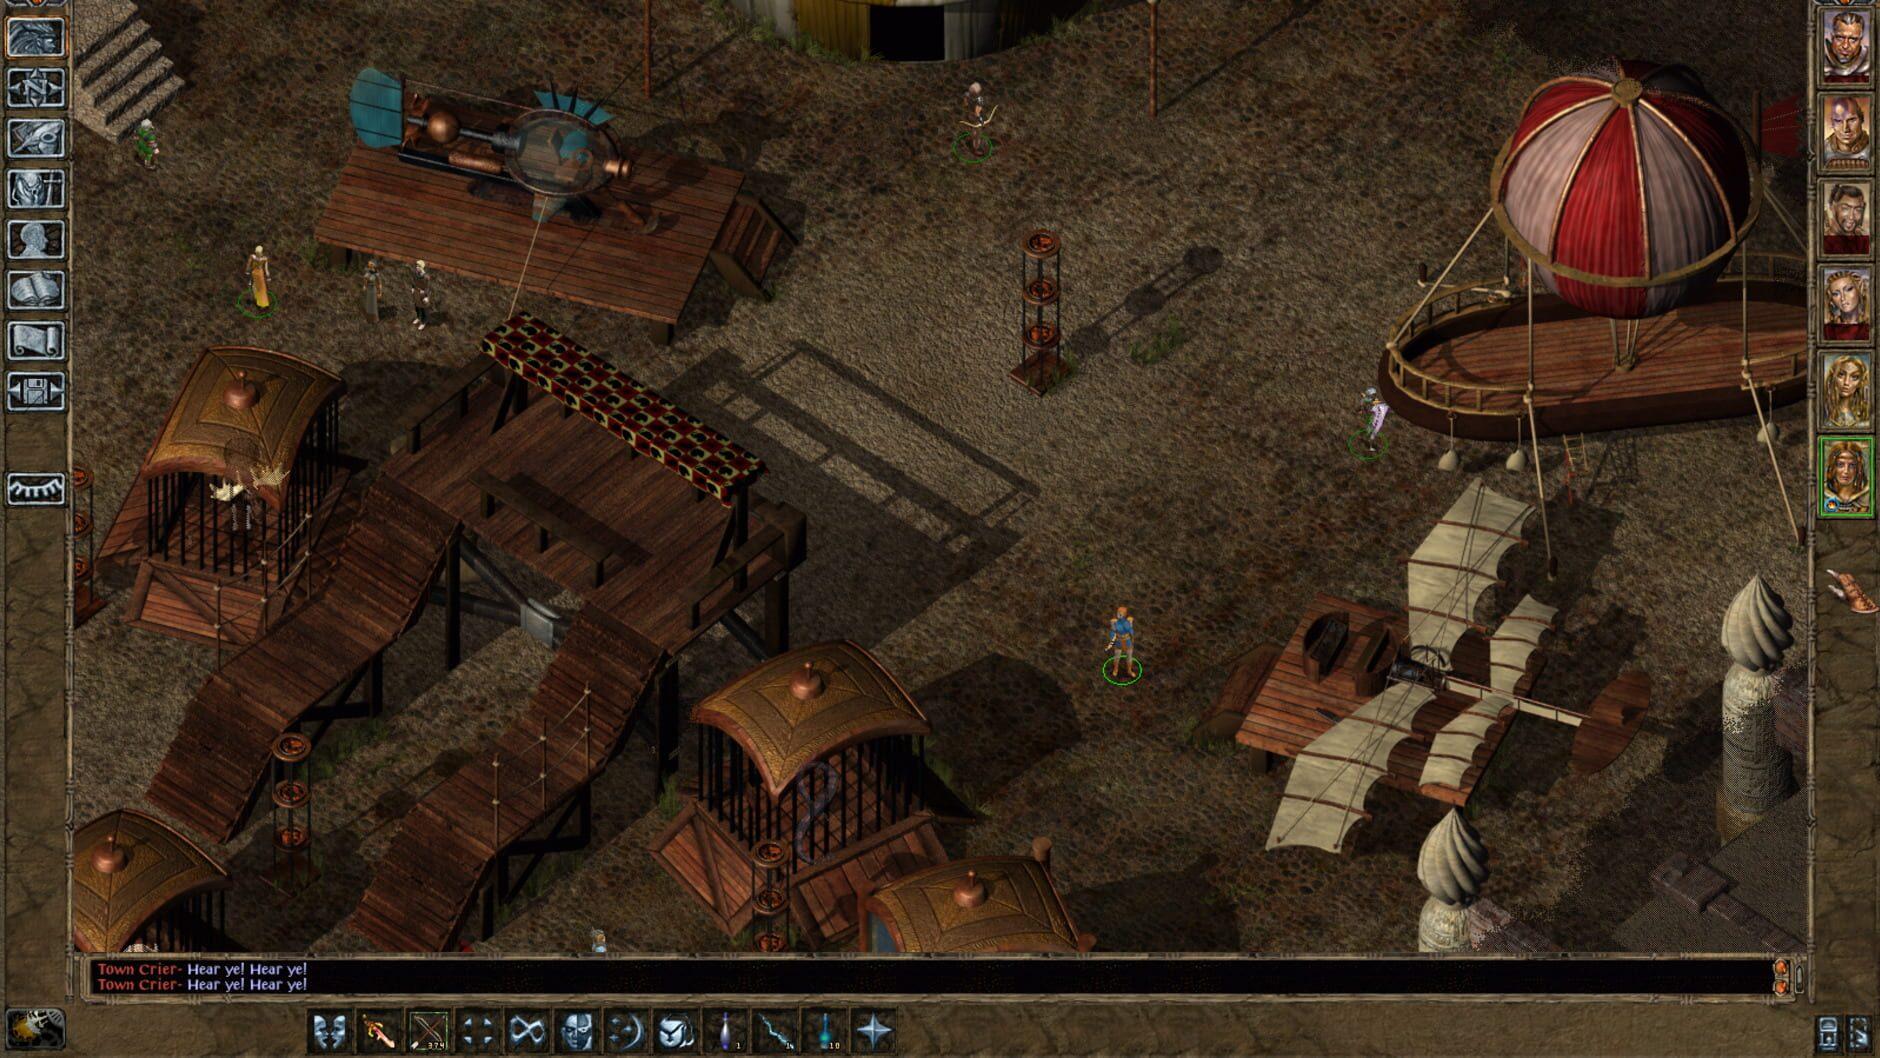 Baldur's Gate II: Shadows Of Amn - 4